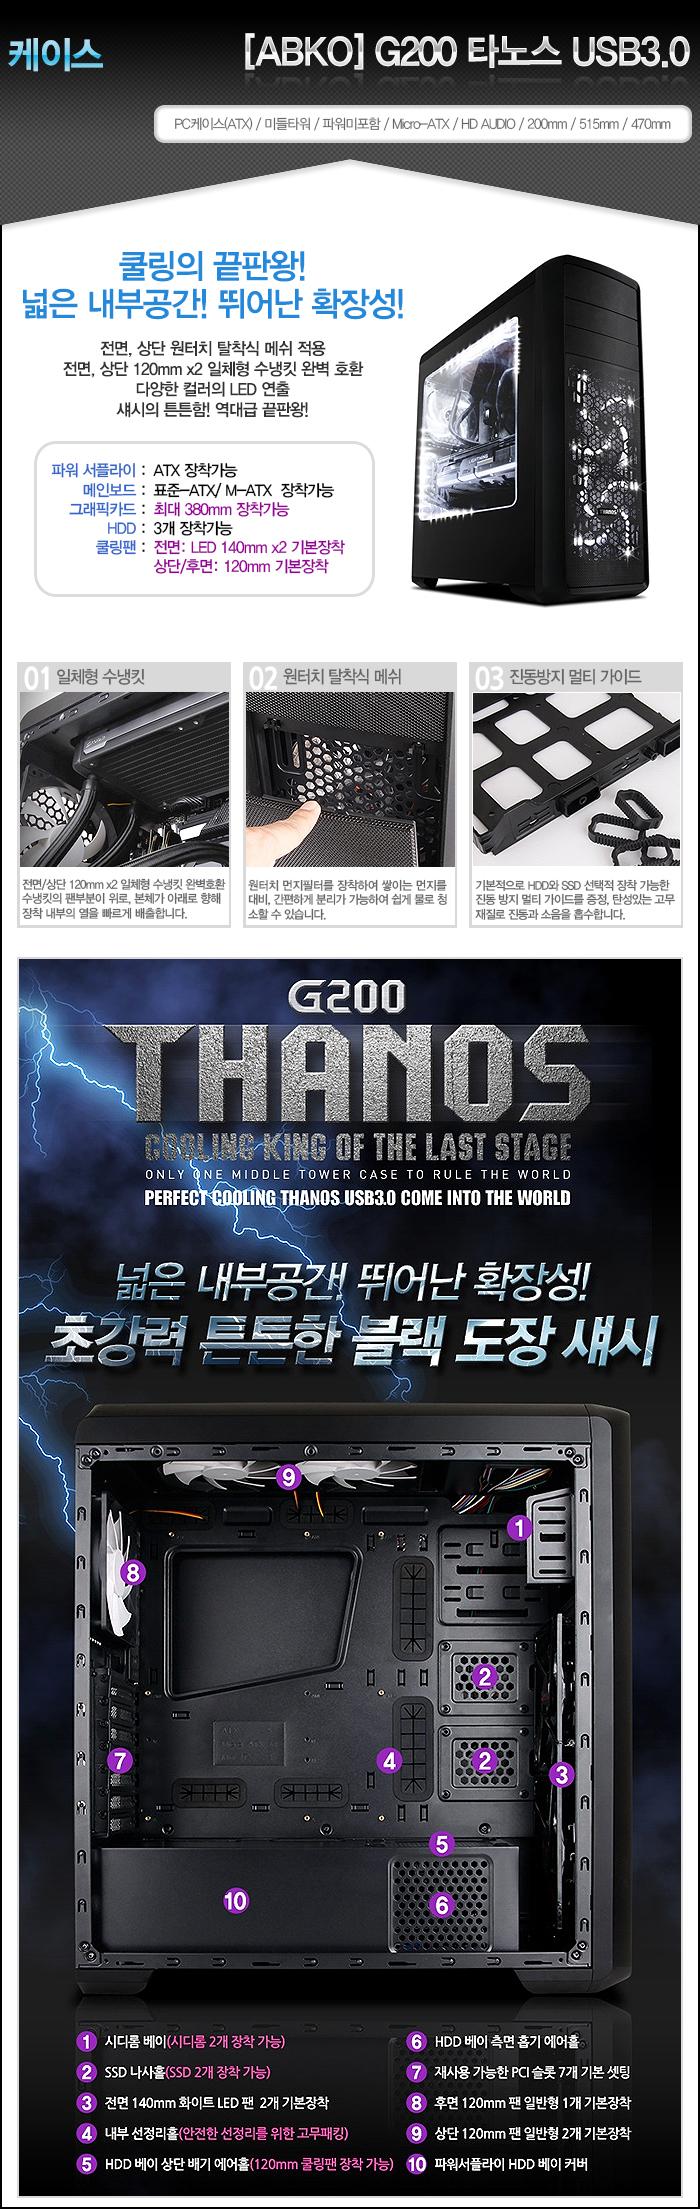 [ABKO] NCORE G200 타노스 USB3.0